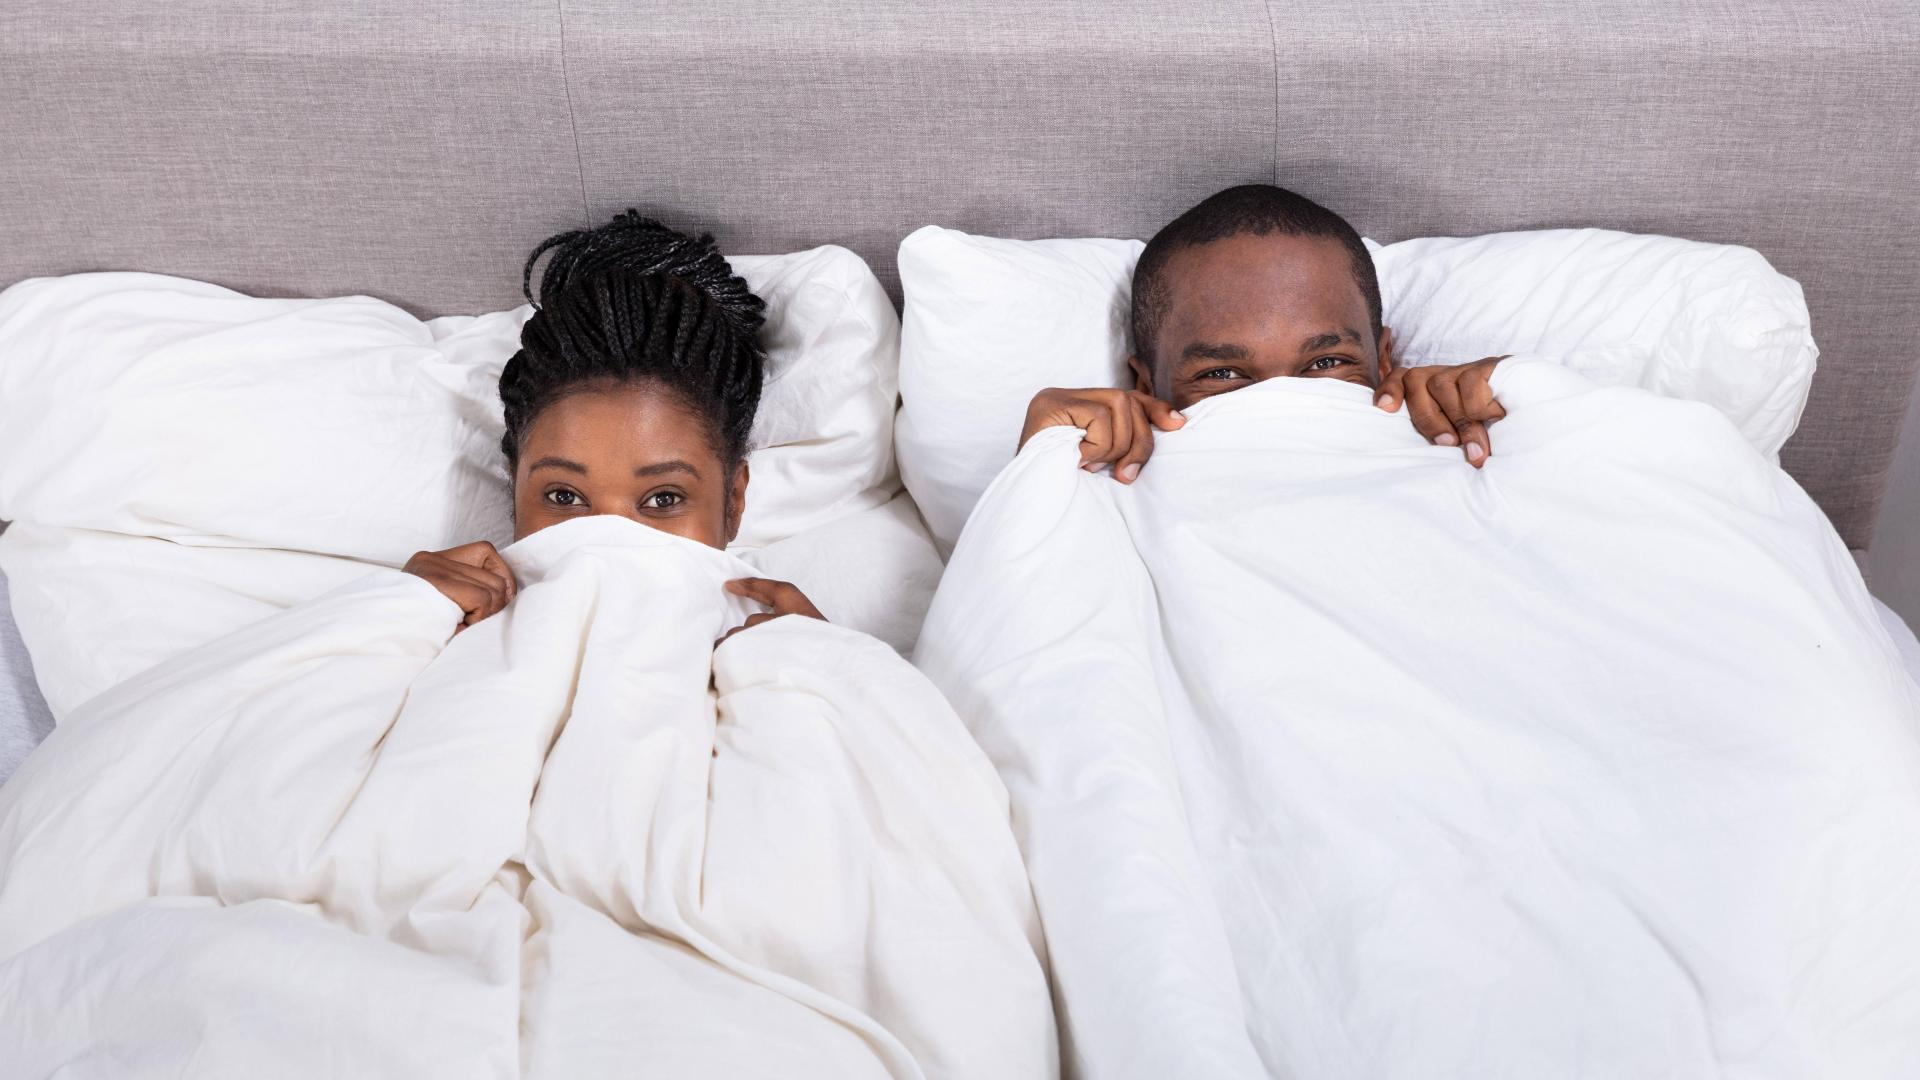 Pärchen im Bett, Decke über dem Kopf